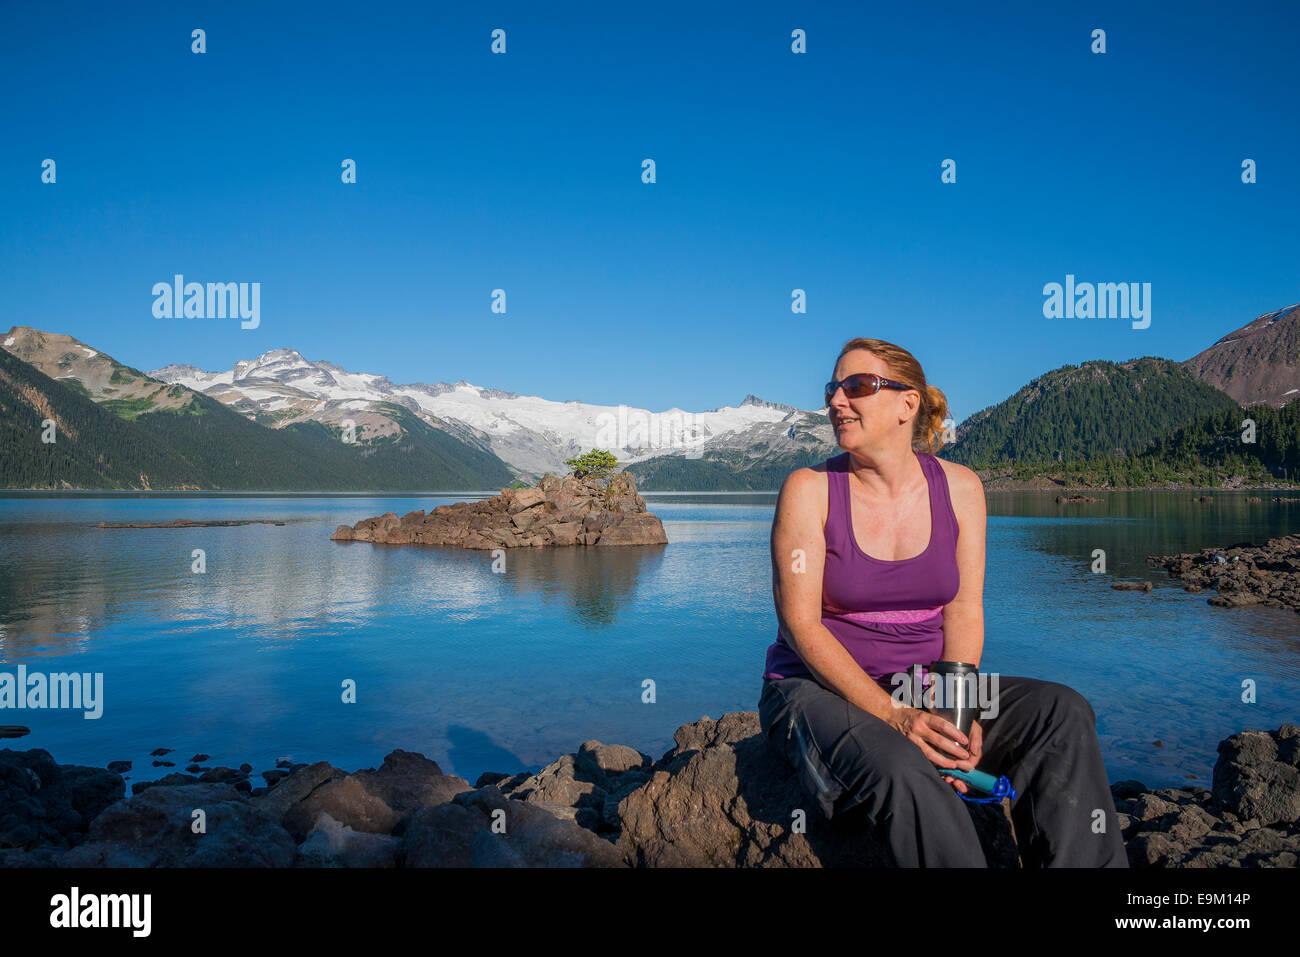 Water Filter Stock Photos & Water Filter Stock Images - Alamy